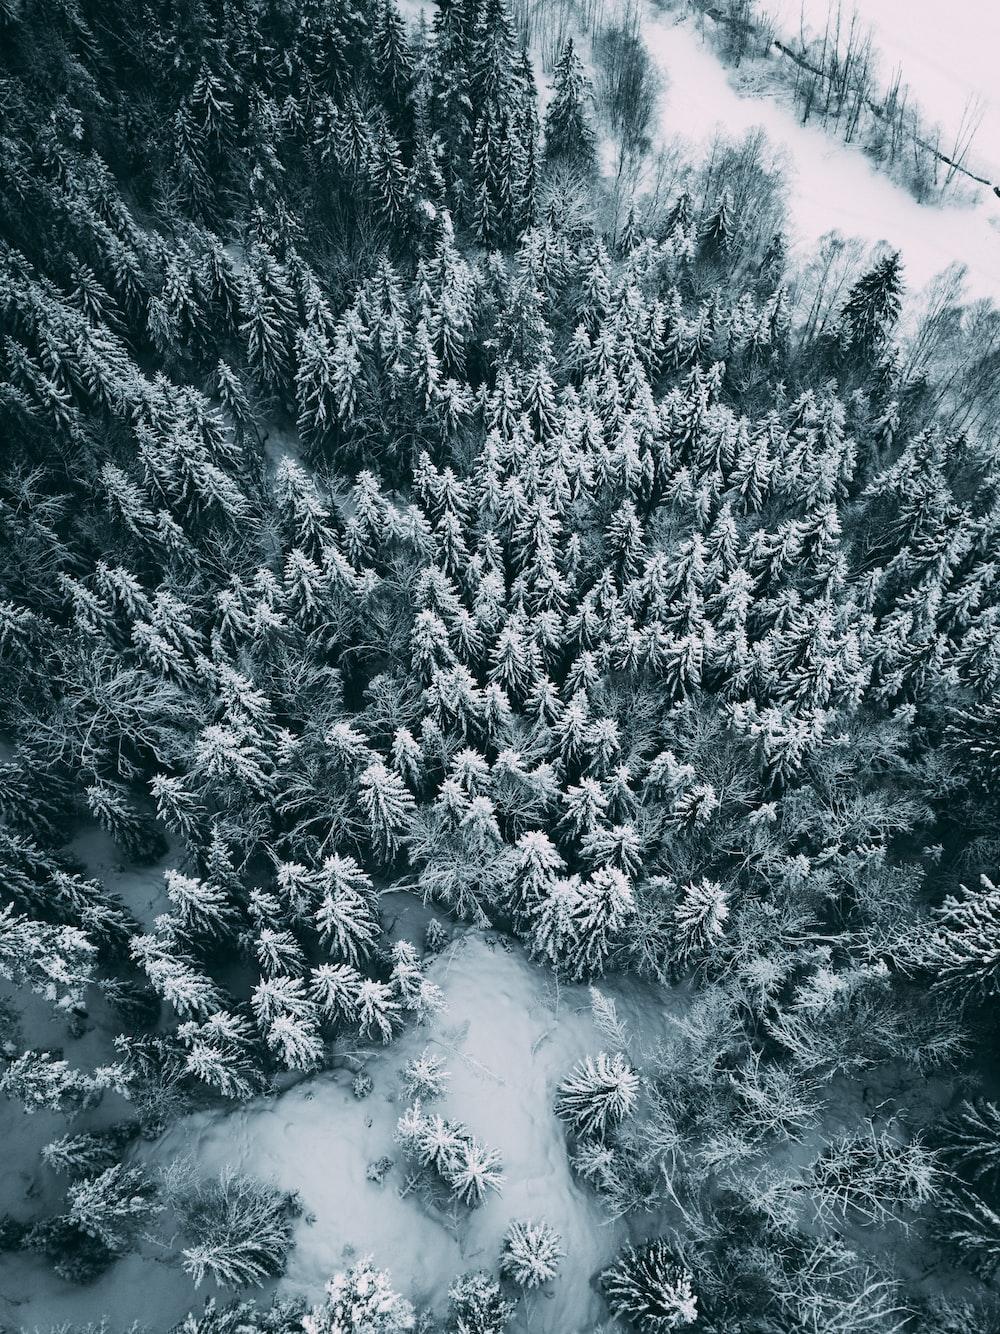 bird's eye view of trees